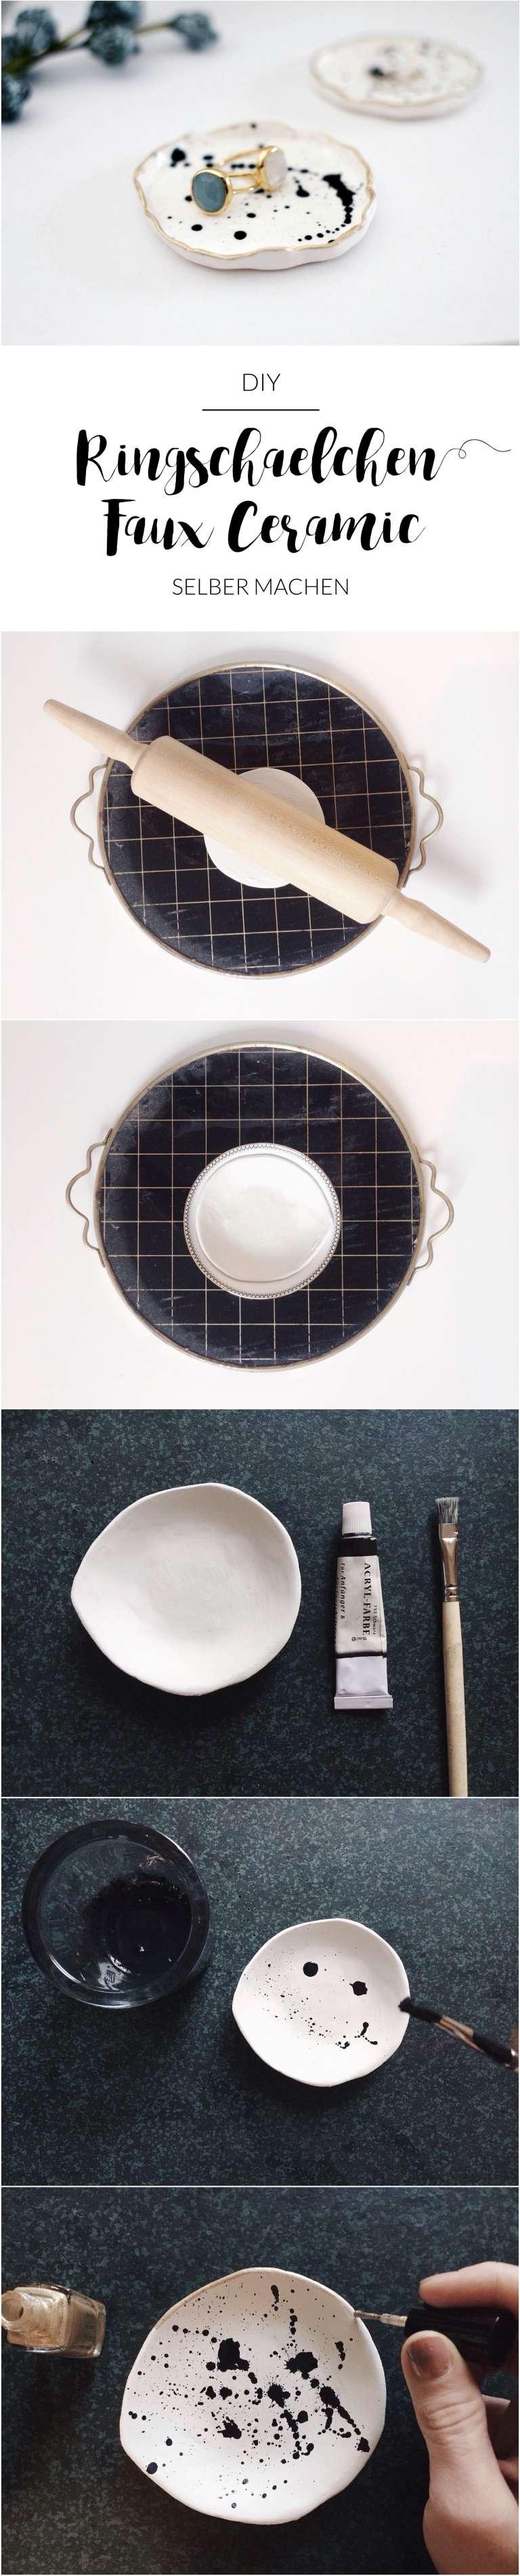 How To Ringschalchen Faux Ceramic Goldrand Modelliermasse Selber Machen Paulsvera